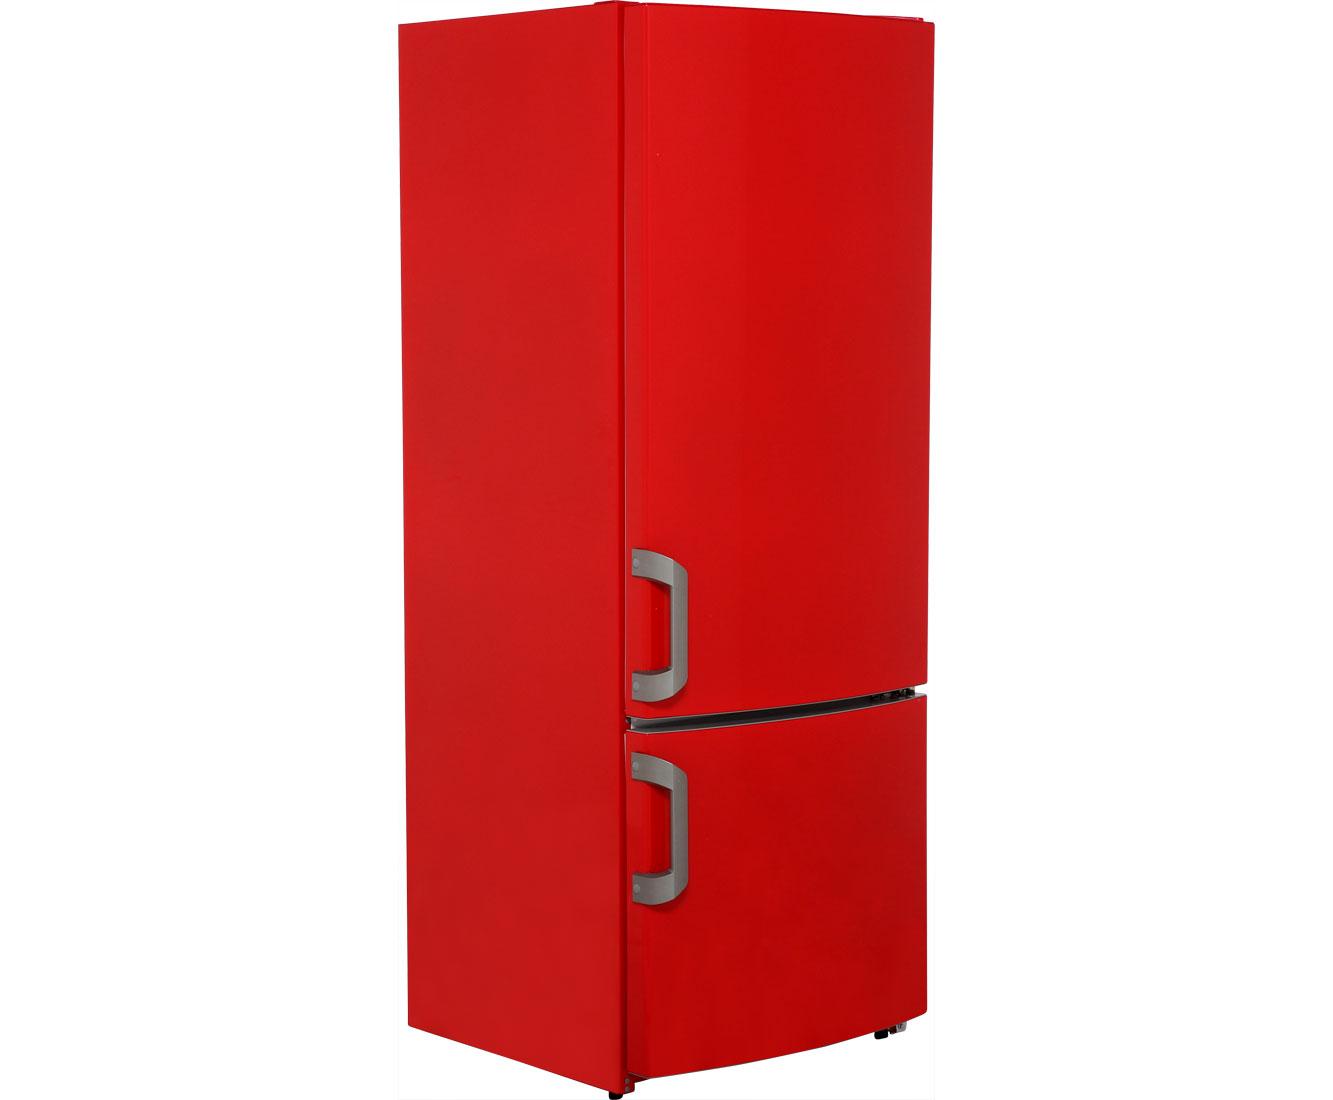 Side By Side Kühlschrank Ratenkauf : Kühlschrank kombi günstig im test lg gbp swqfs kühl